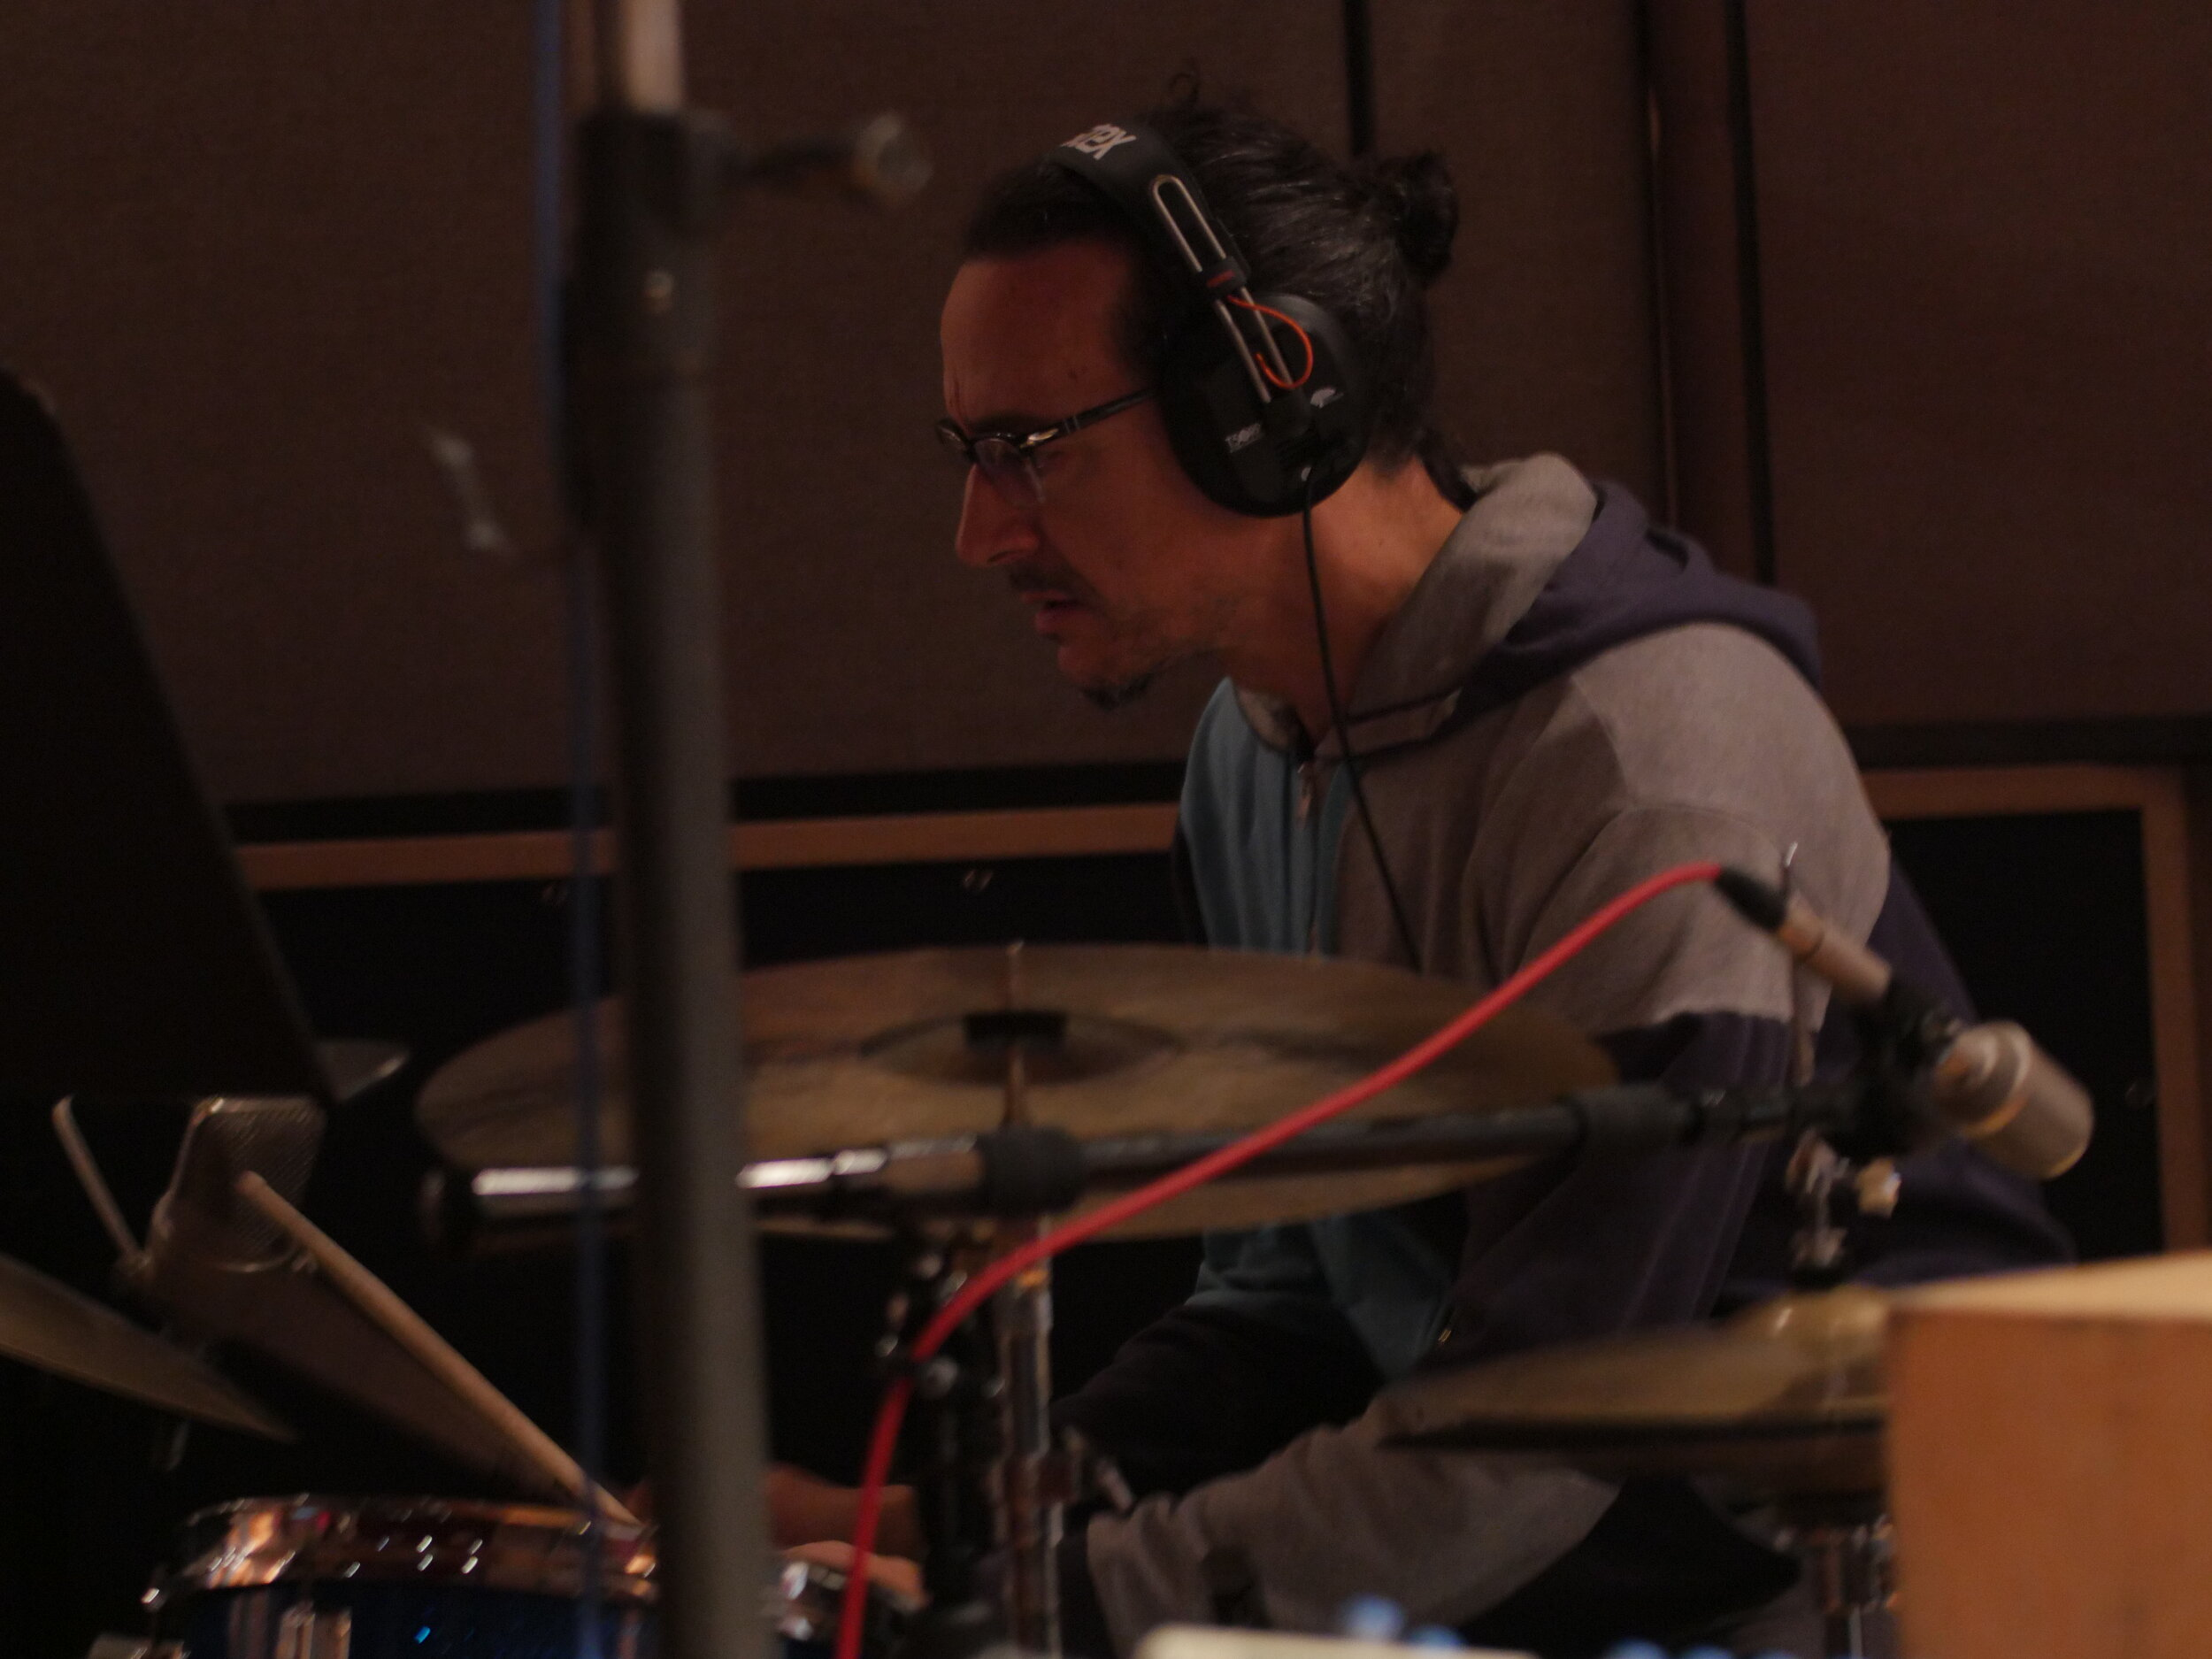 Dan Rieser, SuperBigmouth recording session, Brooklyn, NY November 2017. photo credit: Bradley Rosen